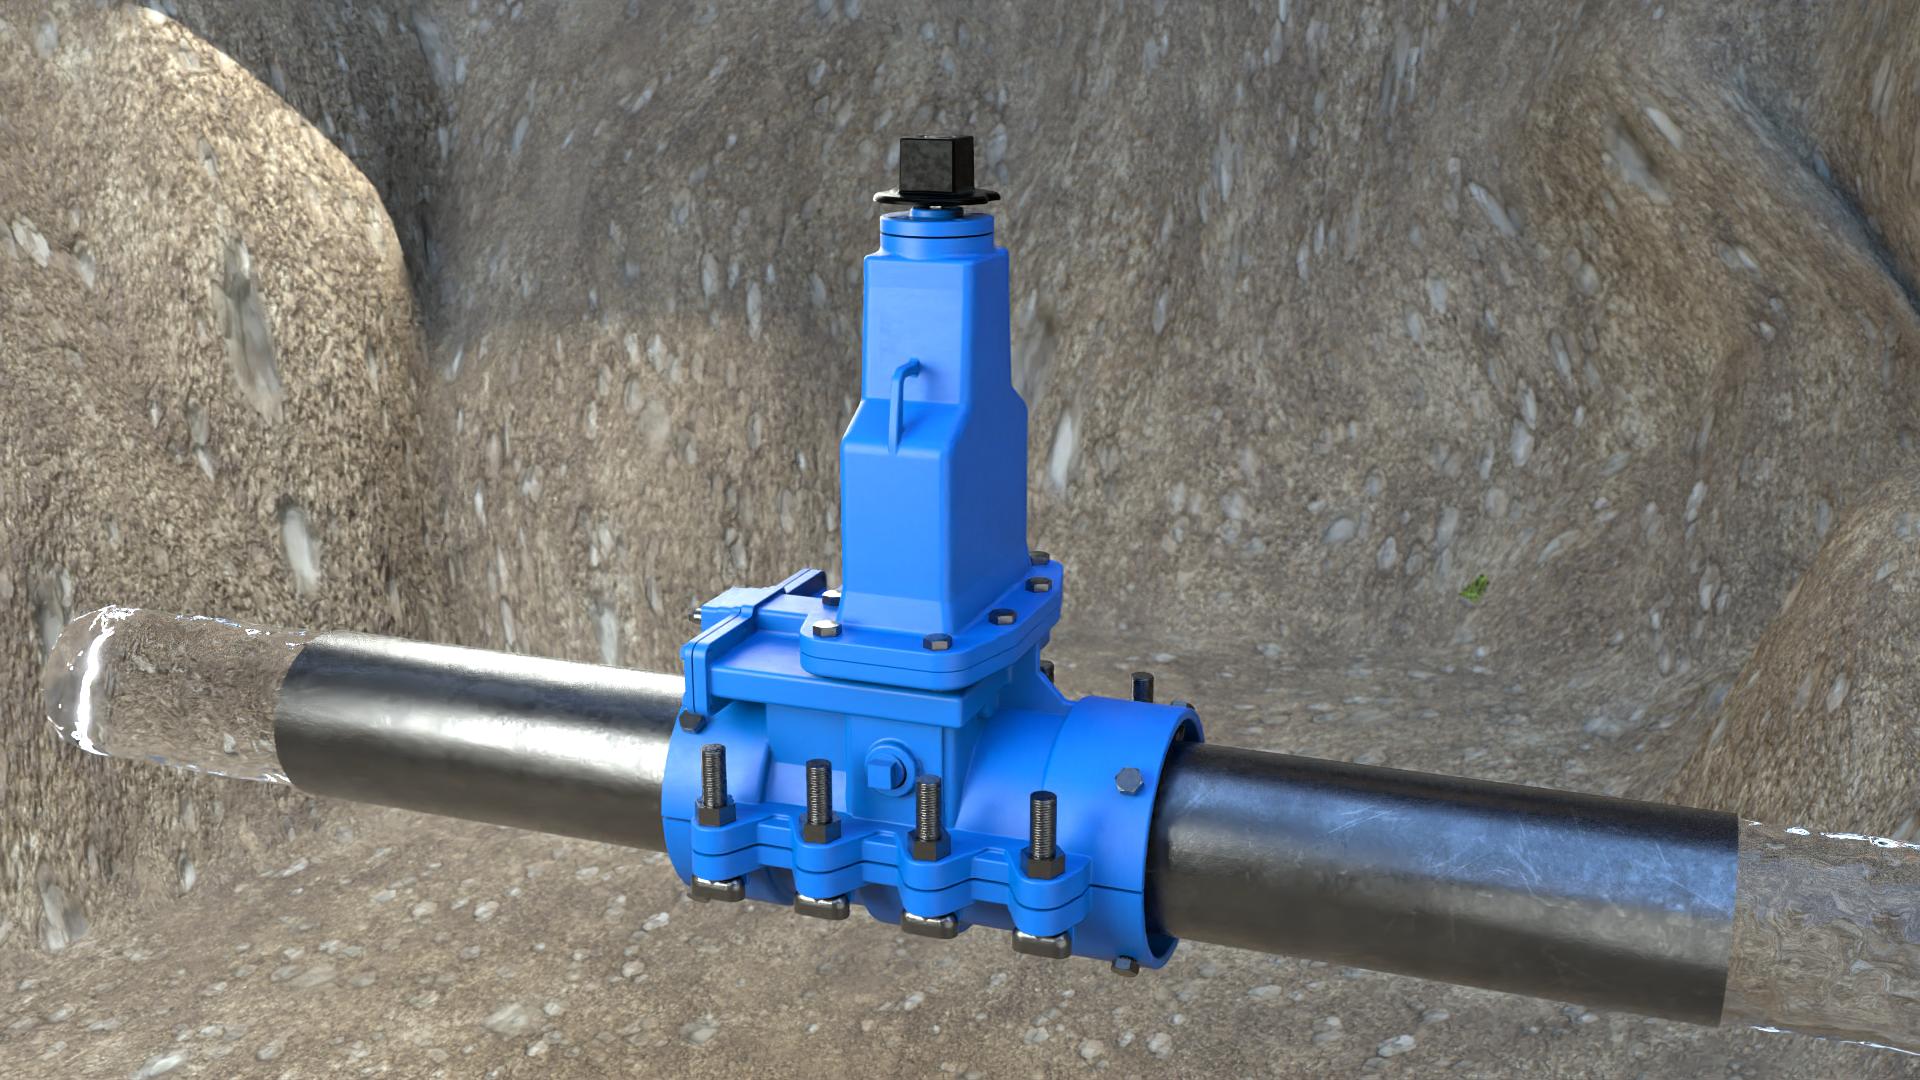 AVT launches animation to demystify insertion valve technology